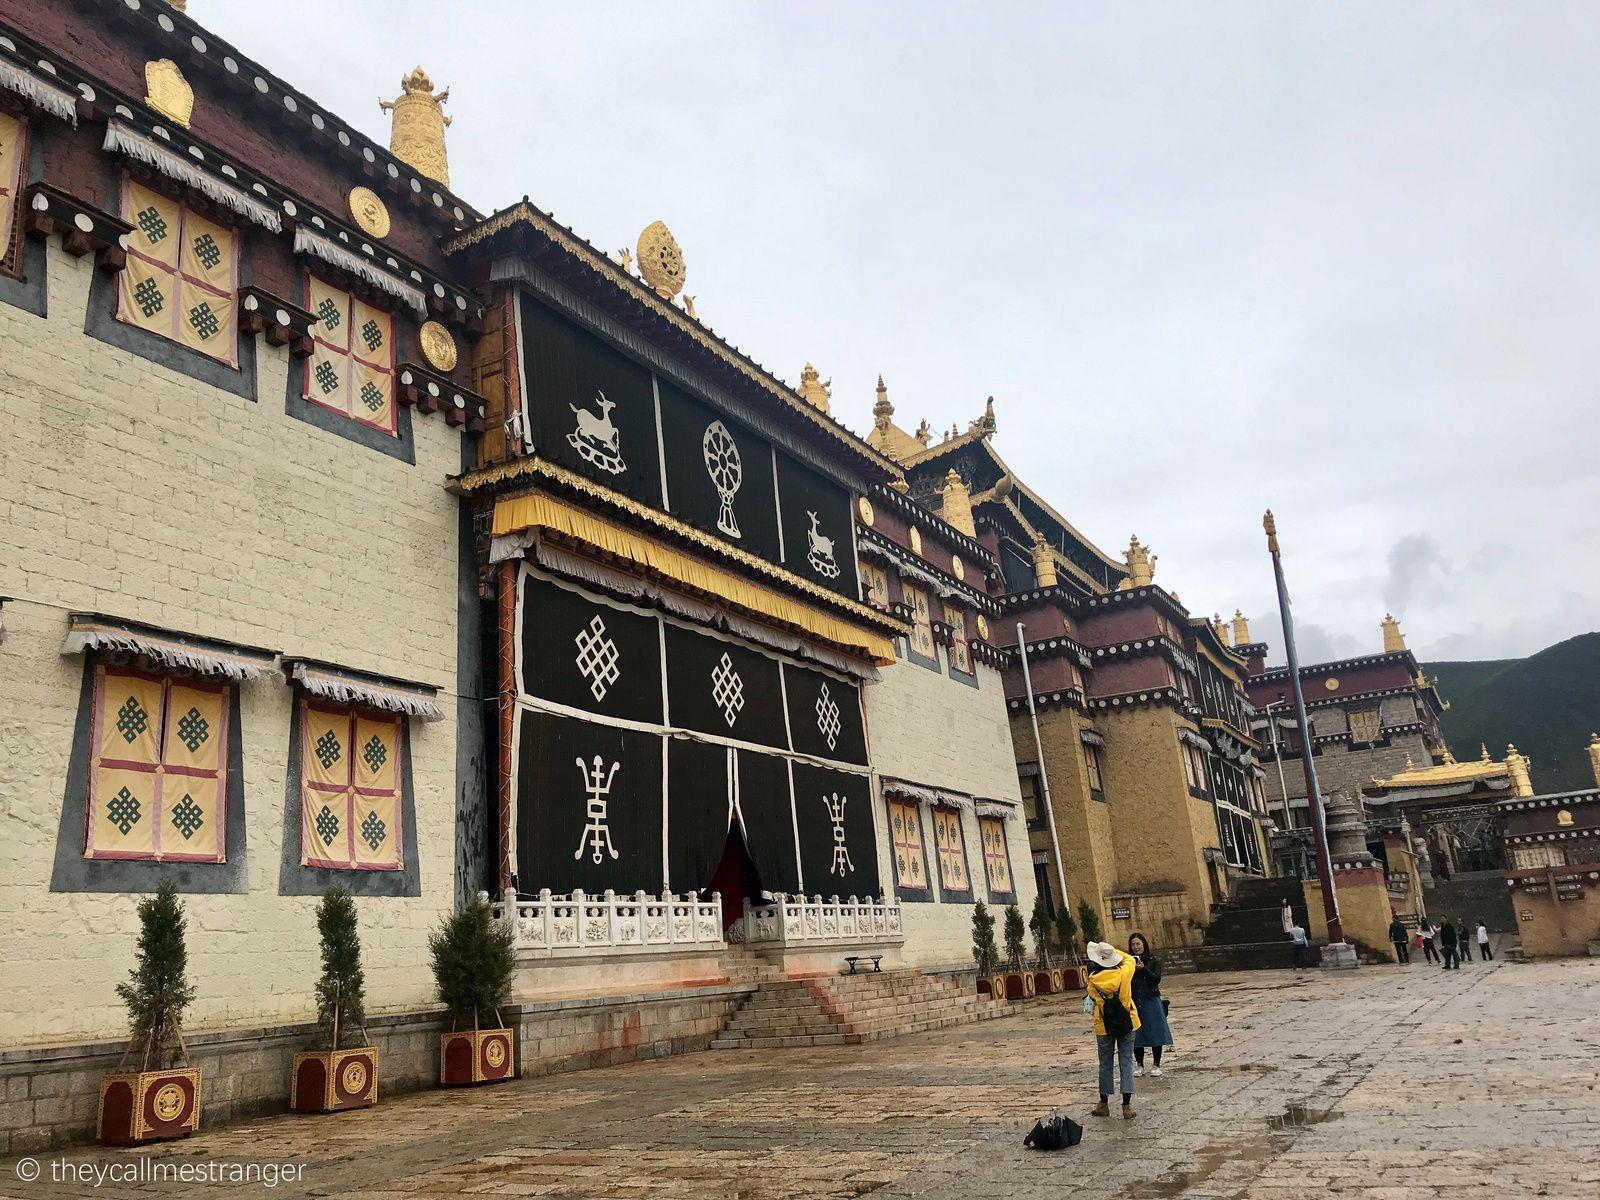 Shangri-la : le monastère tibétain Songzanlin 松赞林寺